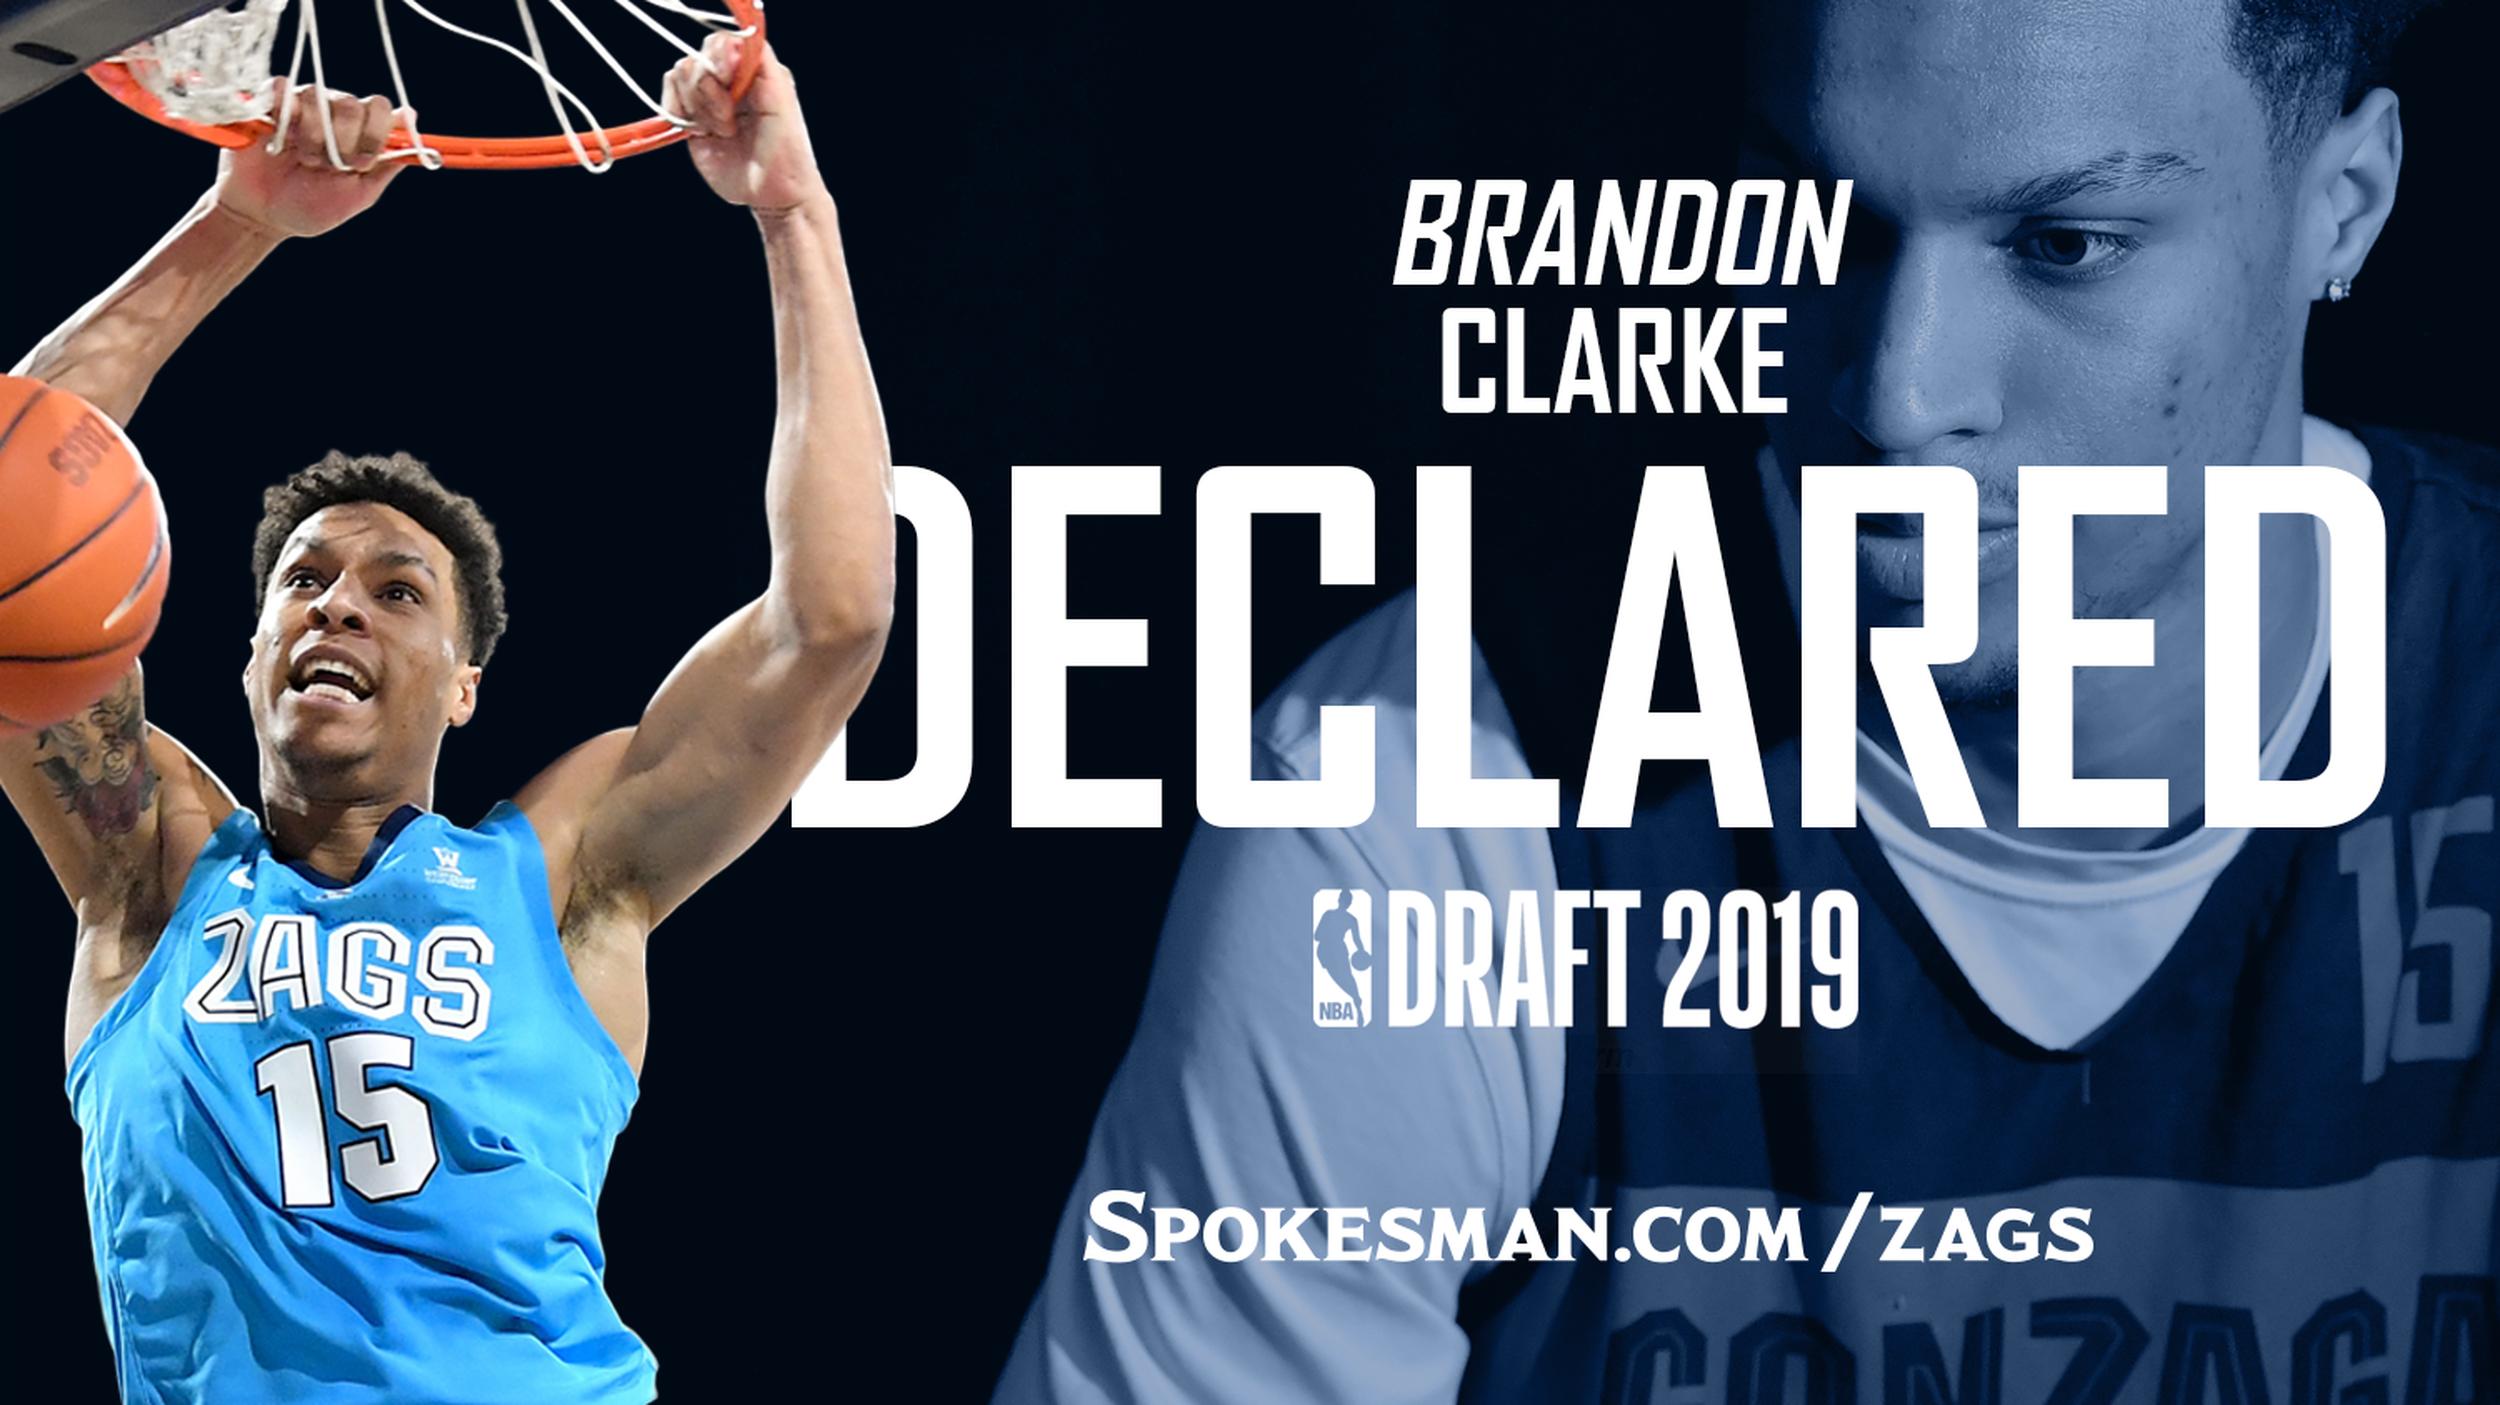 Gonzaga's Brandon Clarke declares for NBA draft | The Spokesman-Review